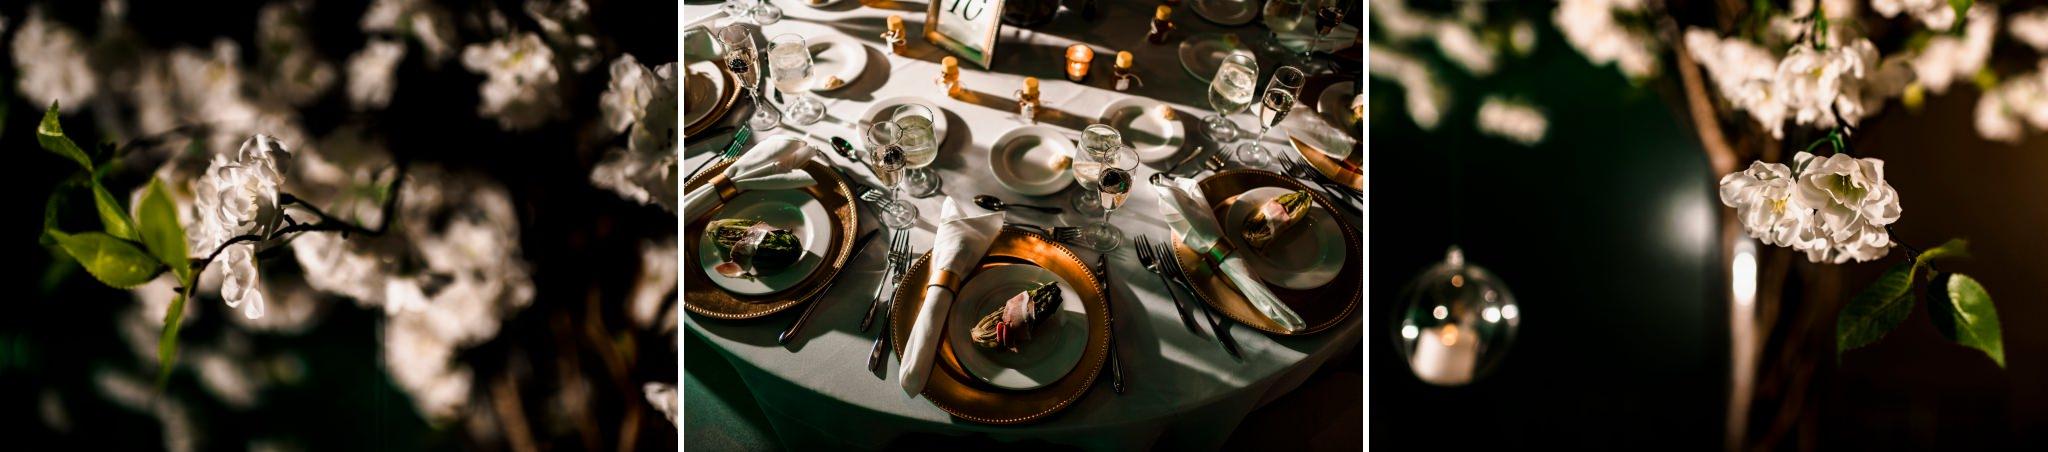 Culos-Sheraton-Eatontown-Long-Branch-Wedding-Photographer-42.JPG